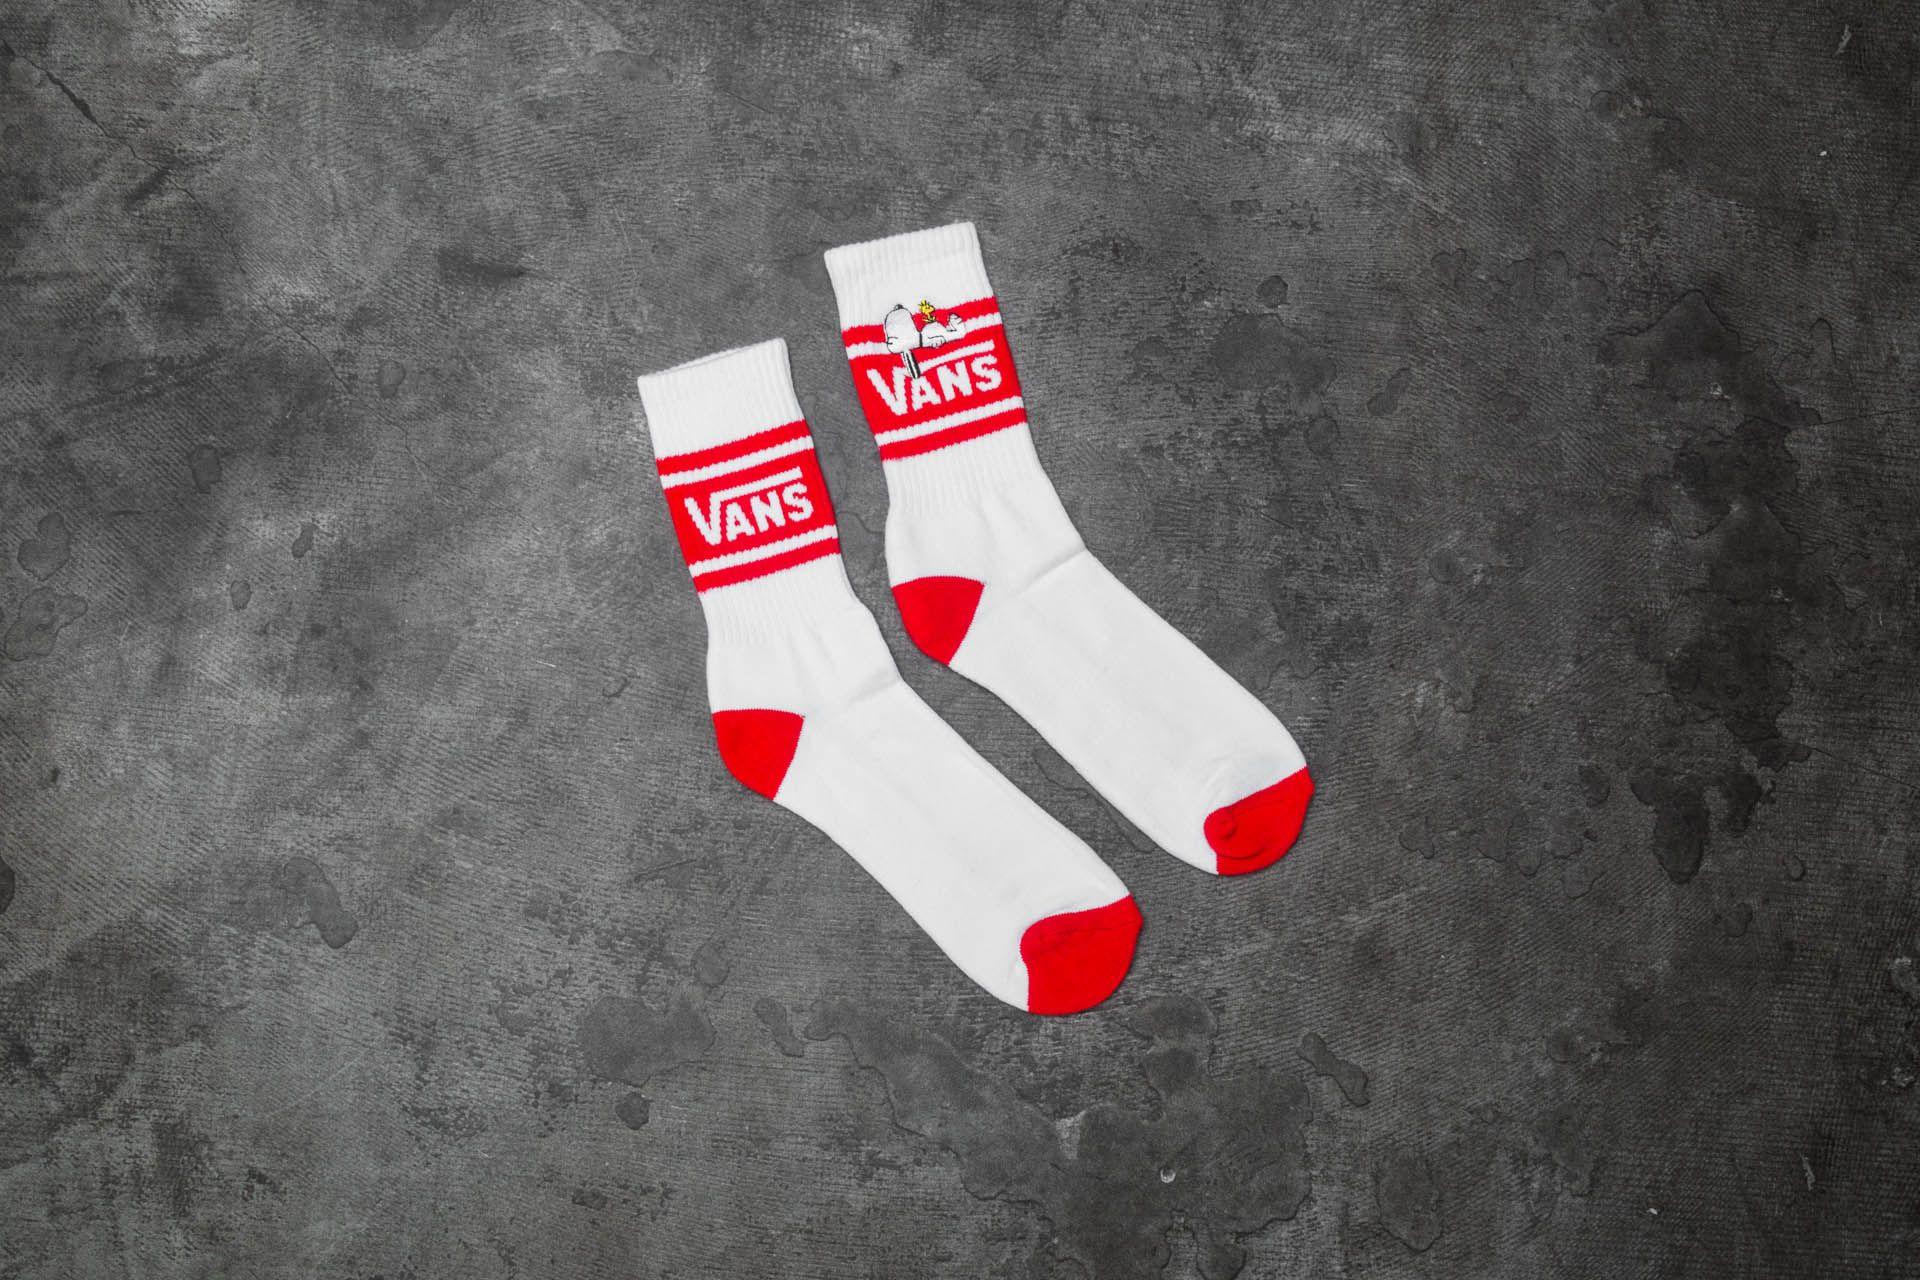 e481ff115c Vans x Peanuts Girl Gang Socks White  Red